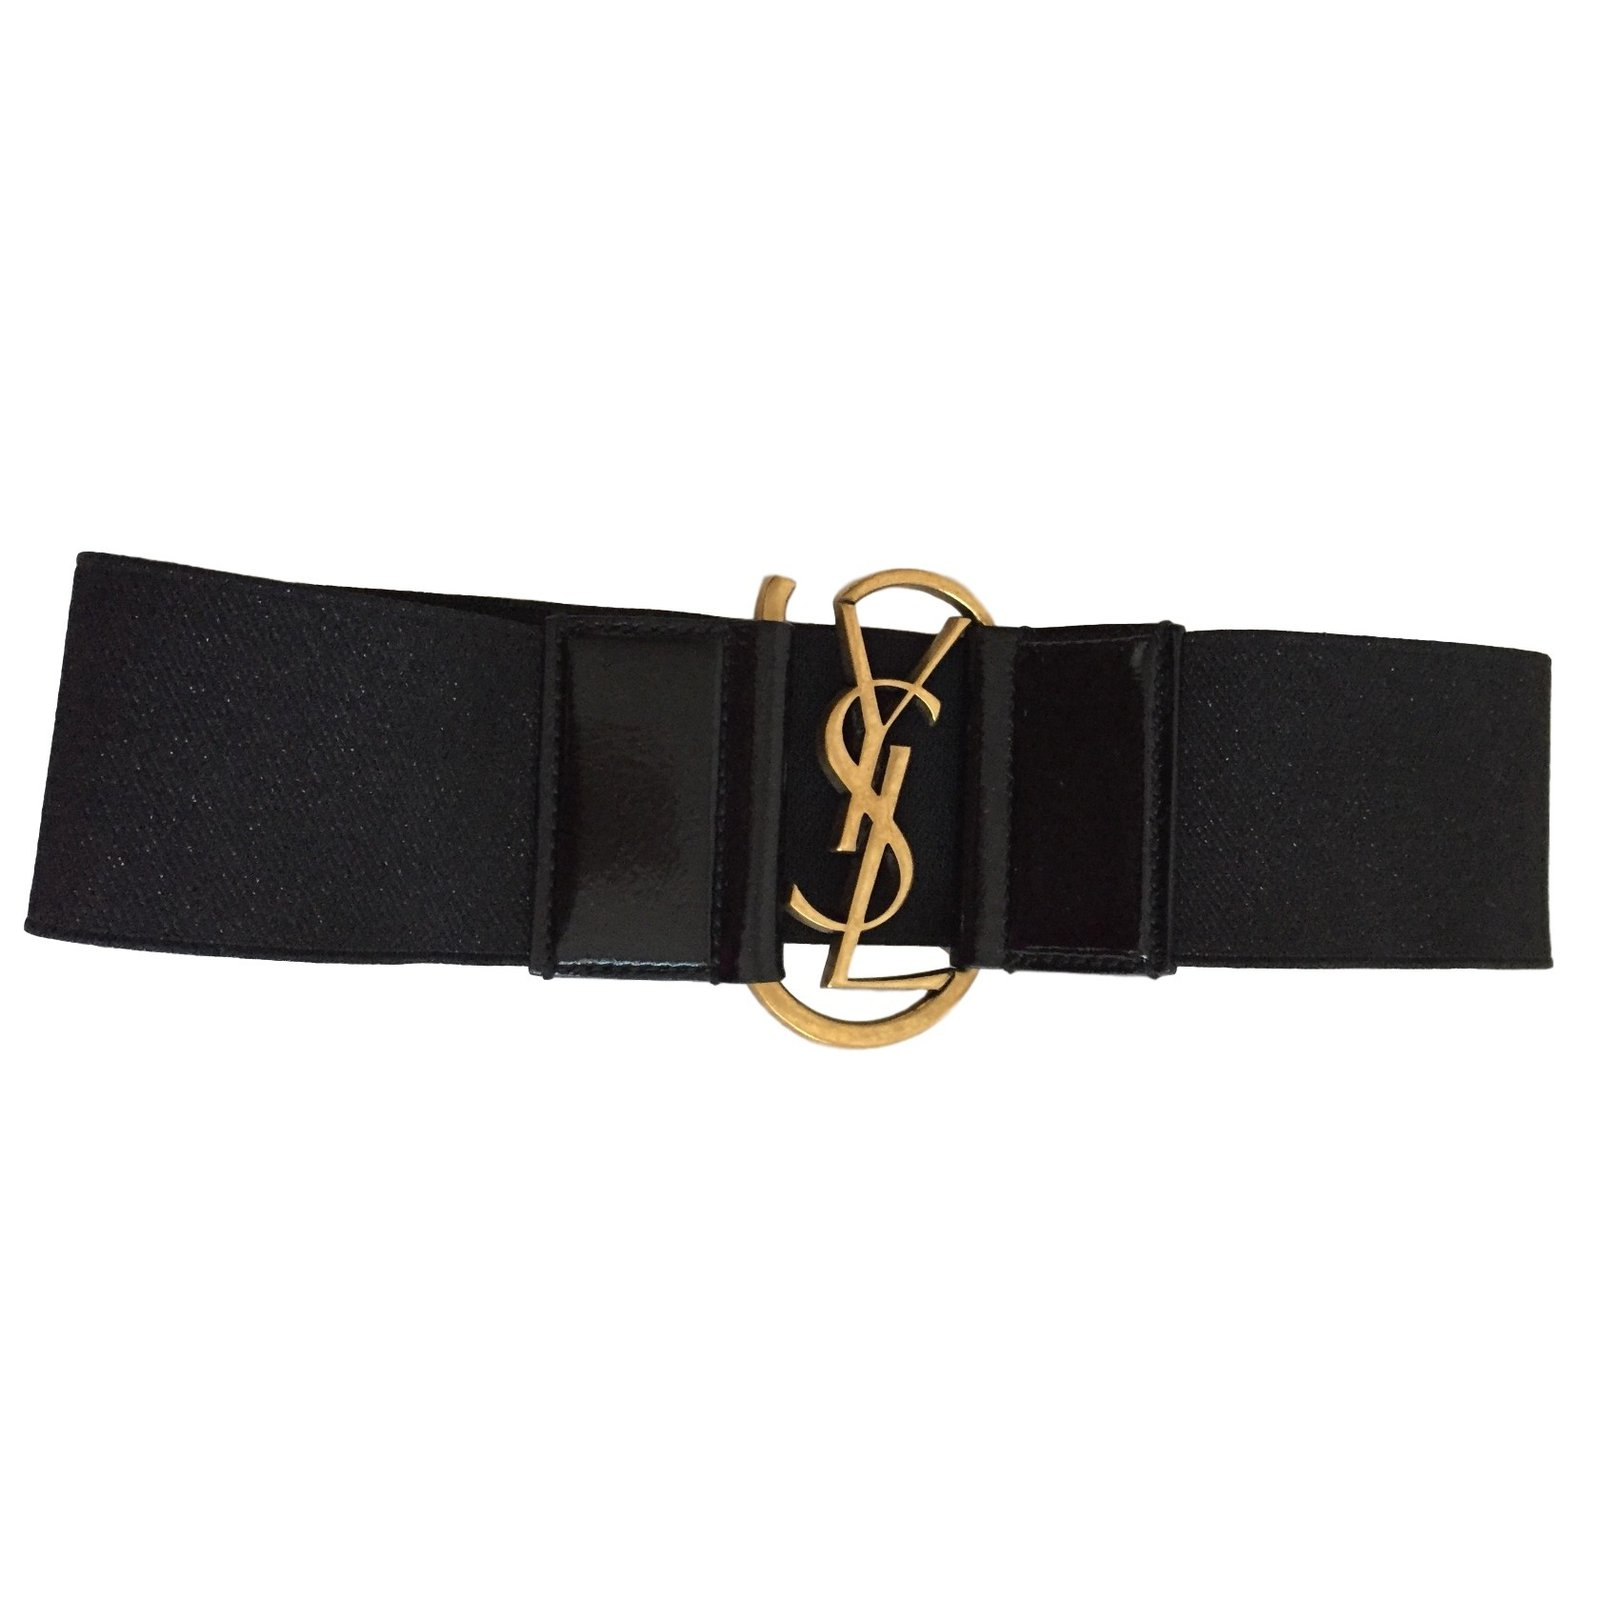 a9ae83953d9d Yves Saint Laurent Belts Belts Elastane Black ref.9303 - Joli Closet